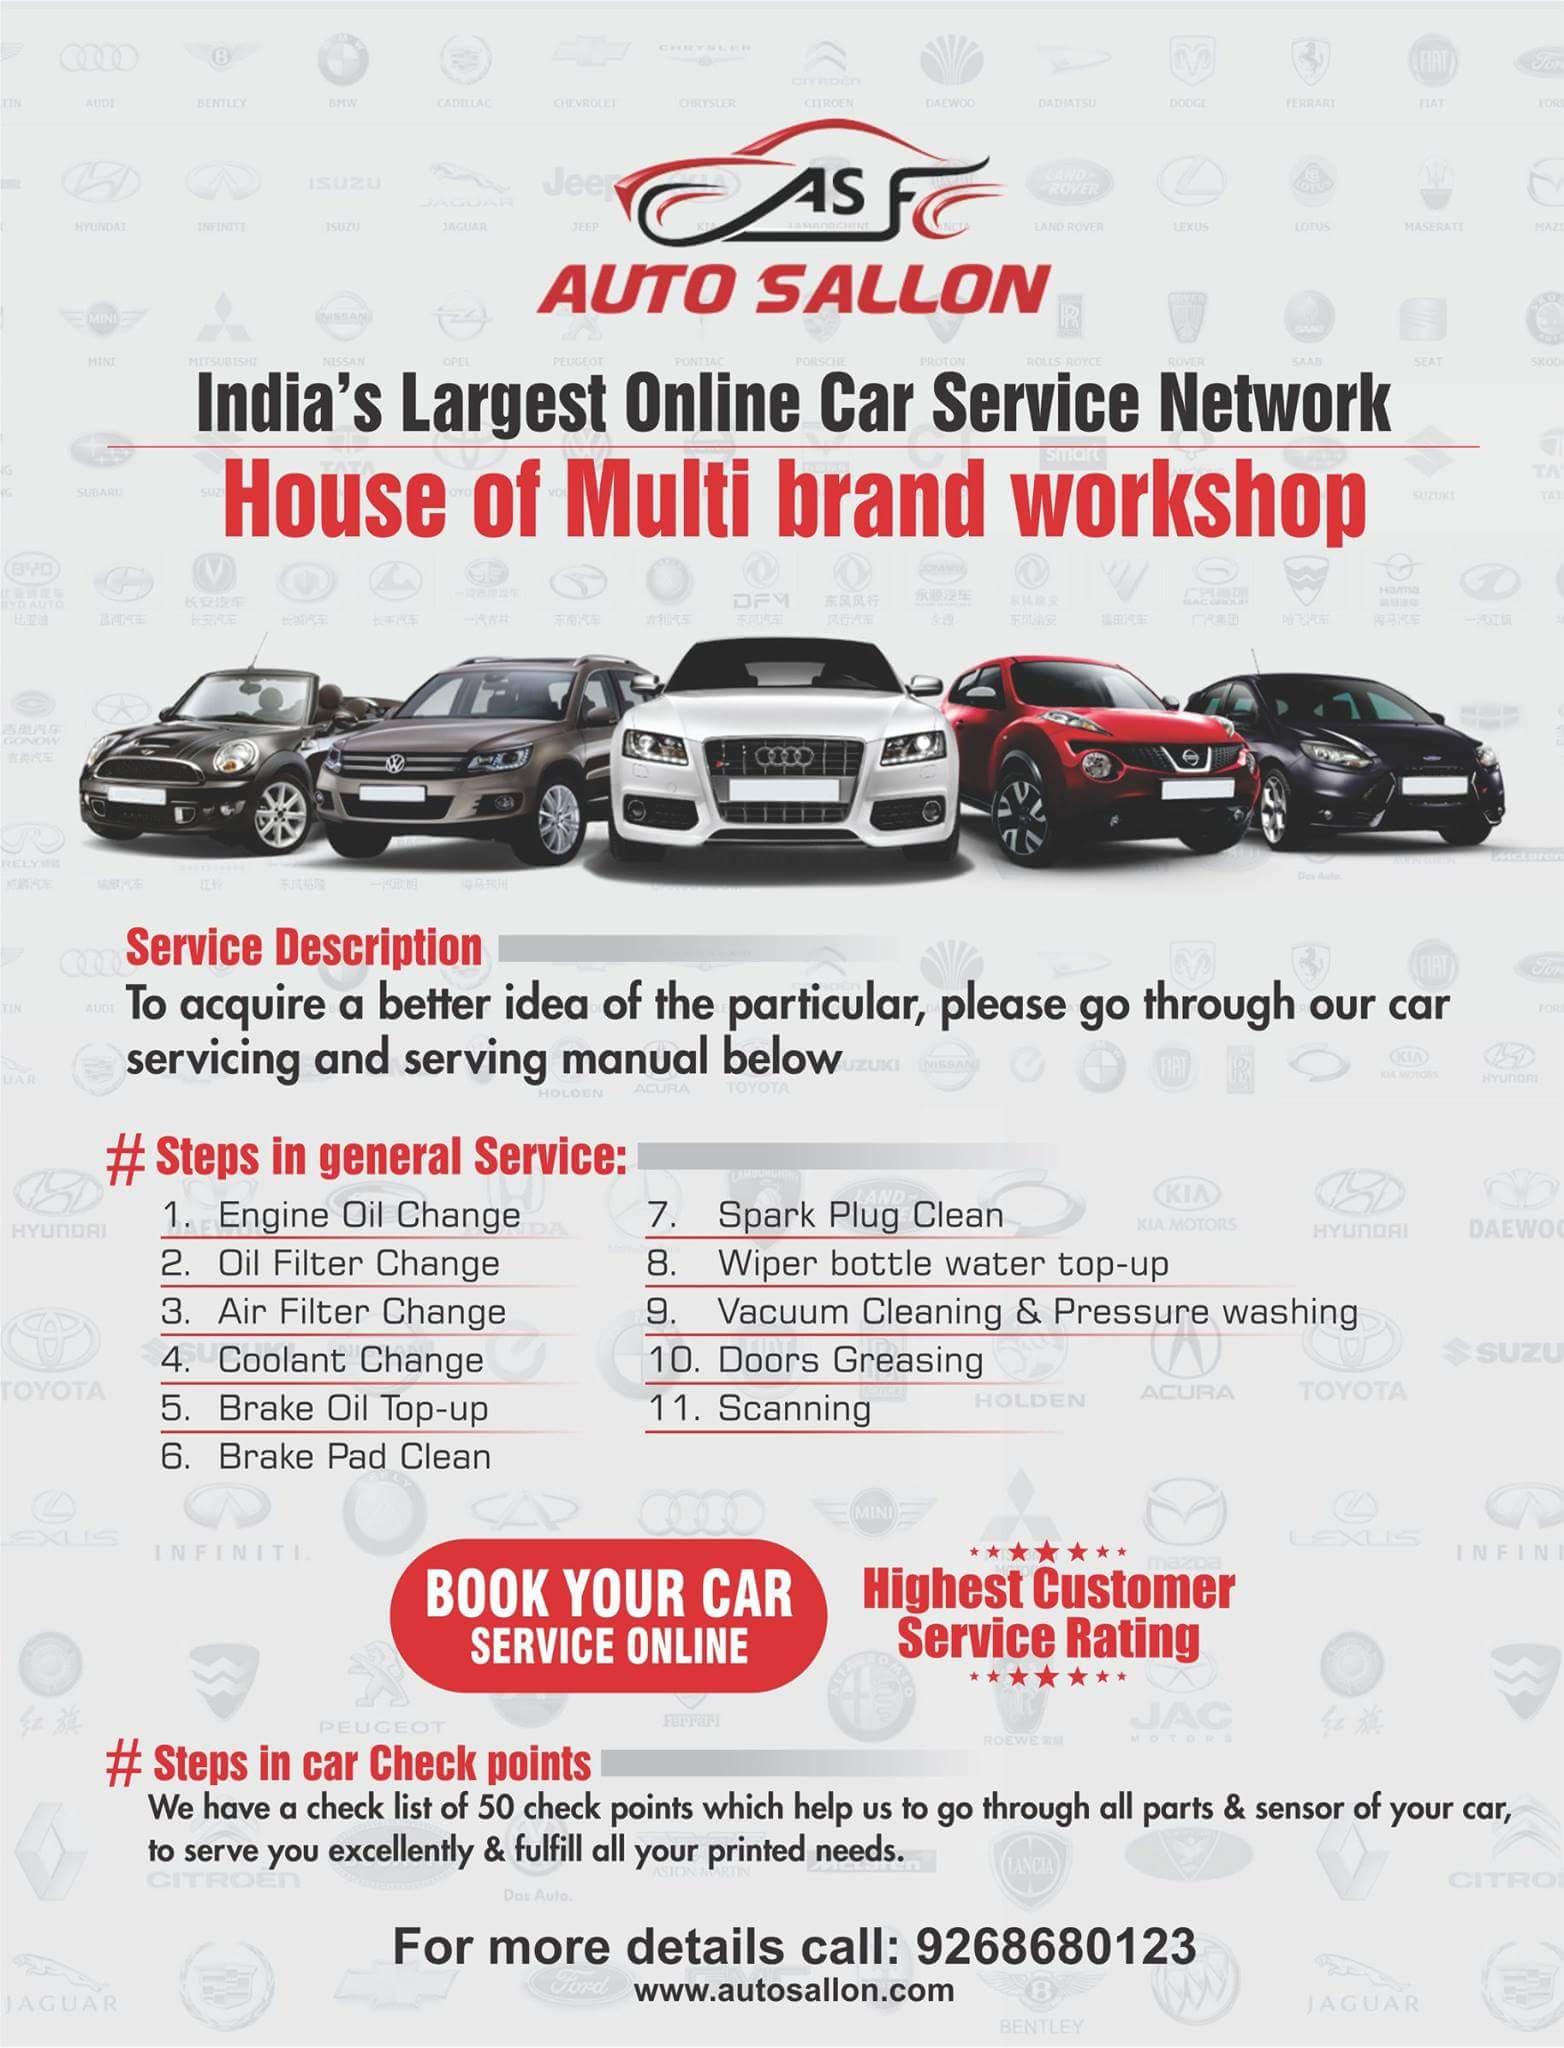 Car Service Centers in Delhi, Car Mechanic, Auto Repair